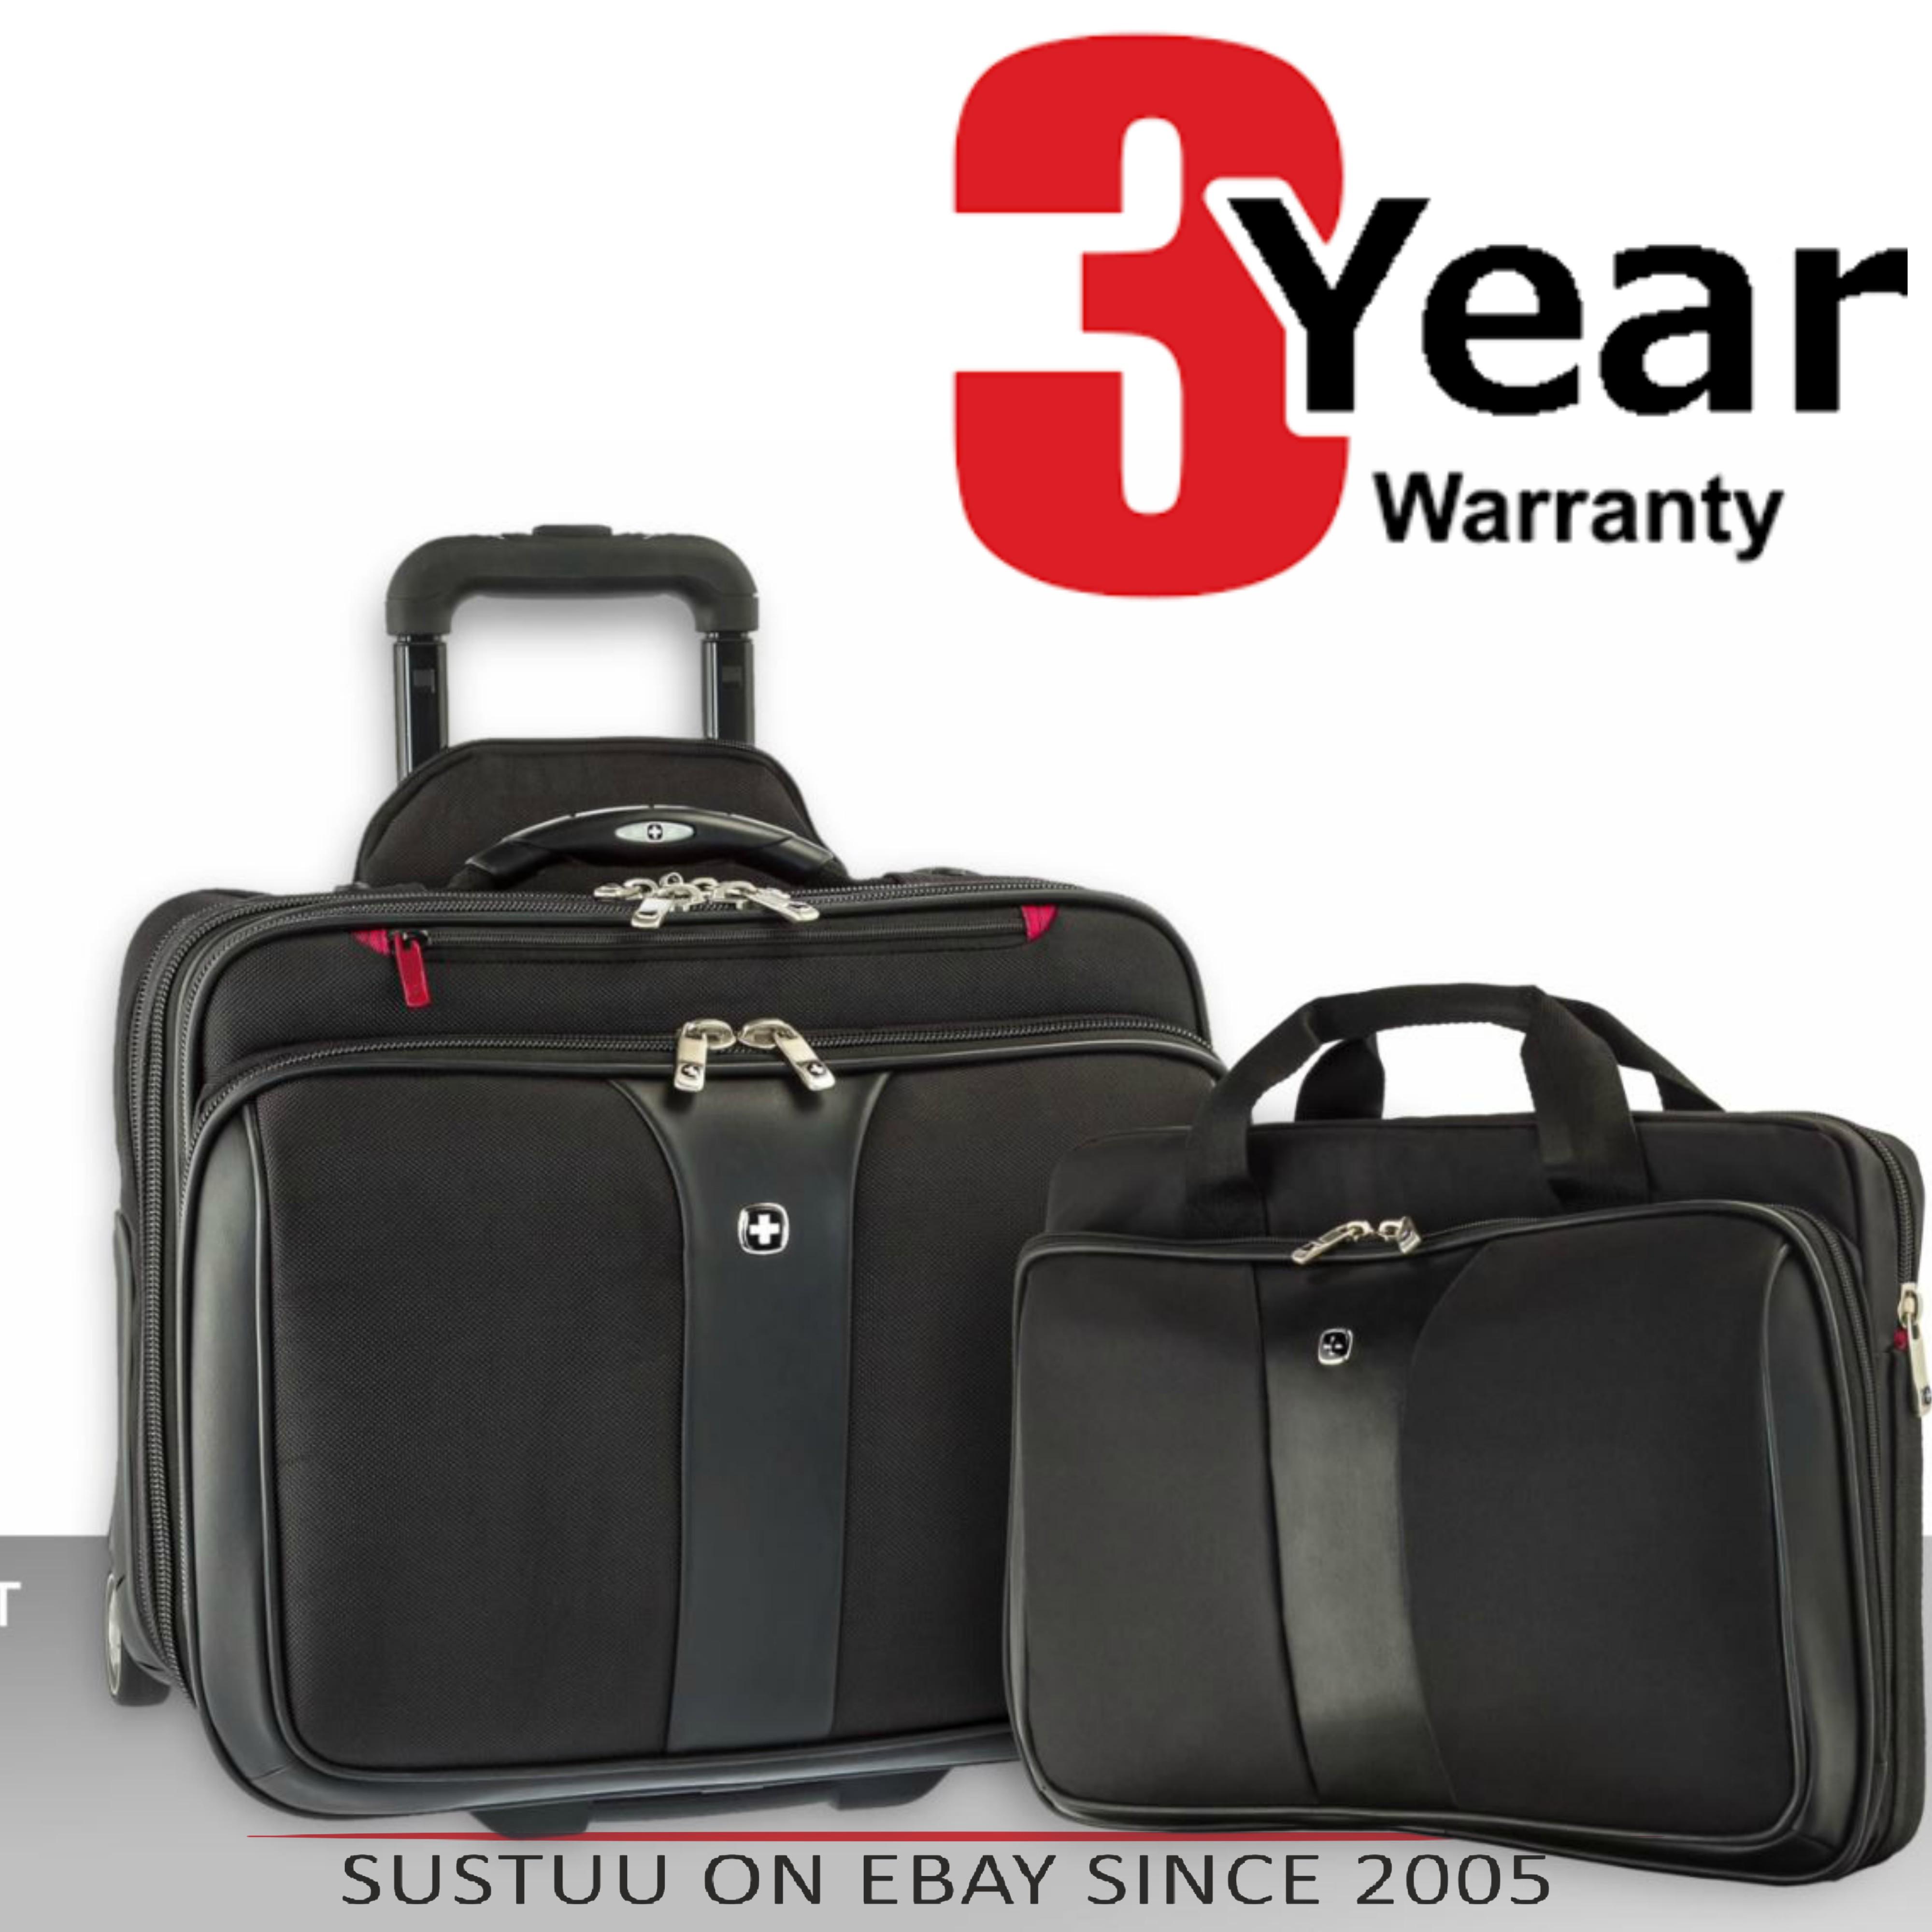 "Wenger 600662 Patriot 17"" Roller Travel Set x 2|Trolley Strap|Flexible|3 Compart Bag"